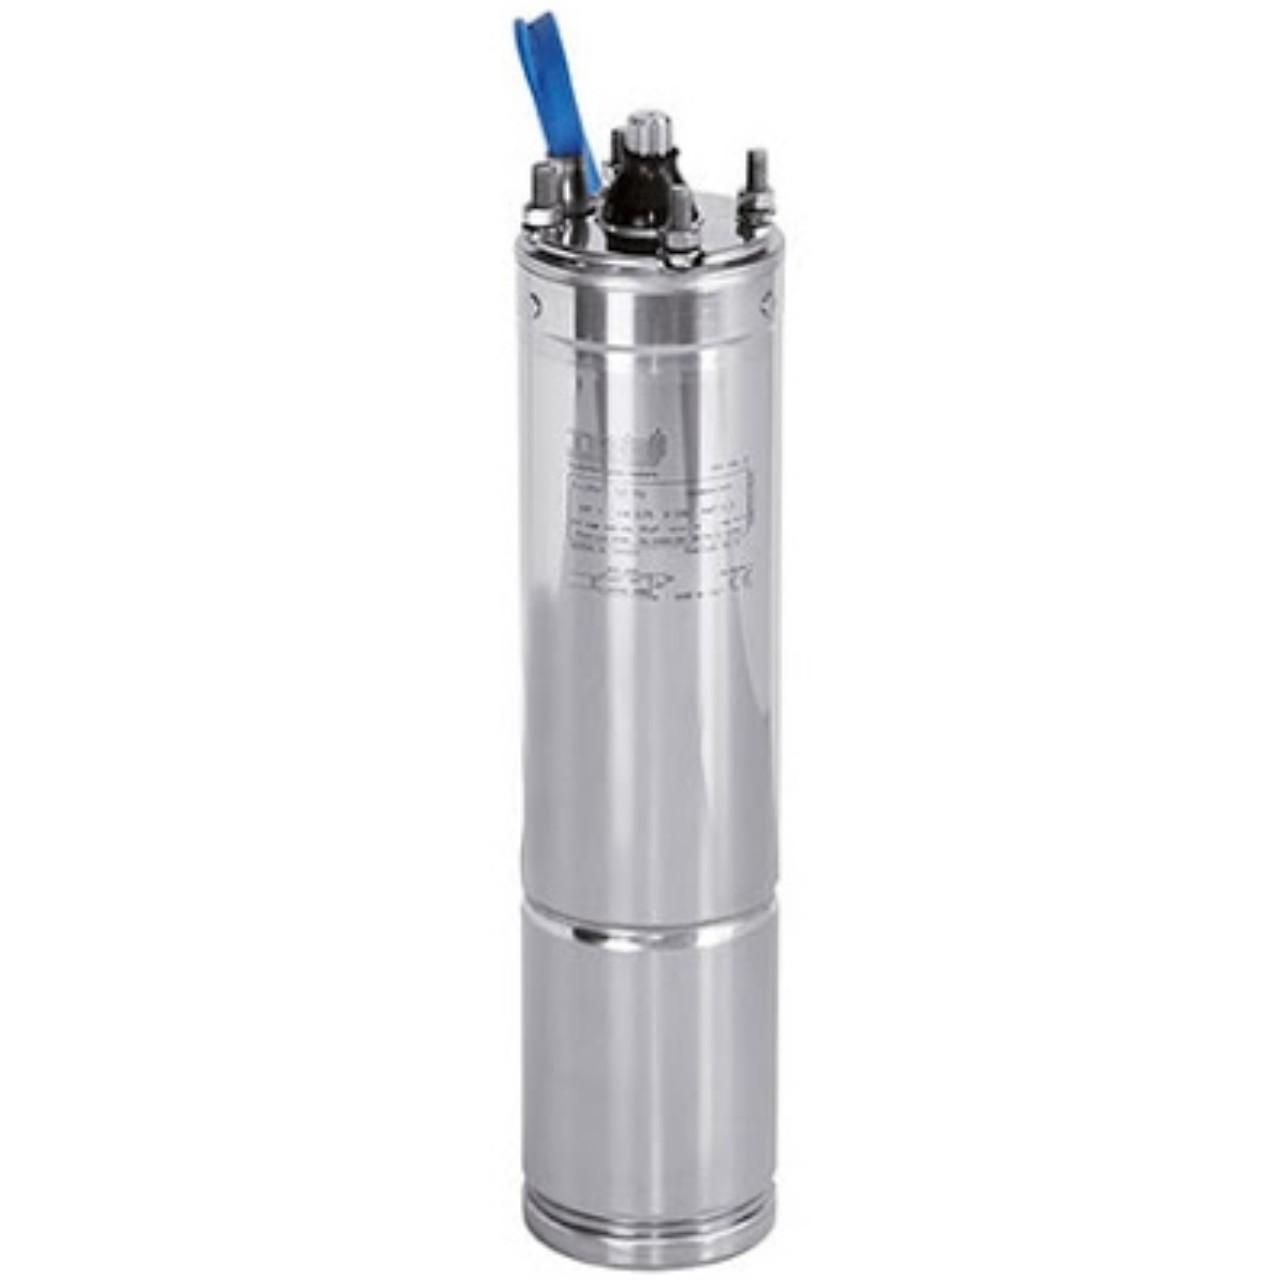 الکترو موتور شناور دیزل ساز مدل 4sd2.2s-3hp